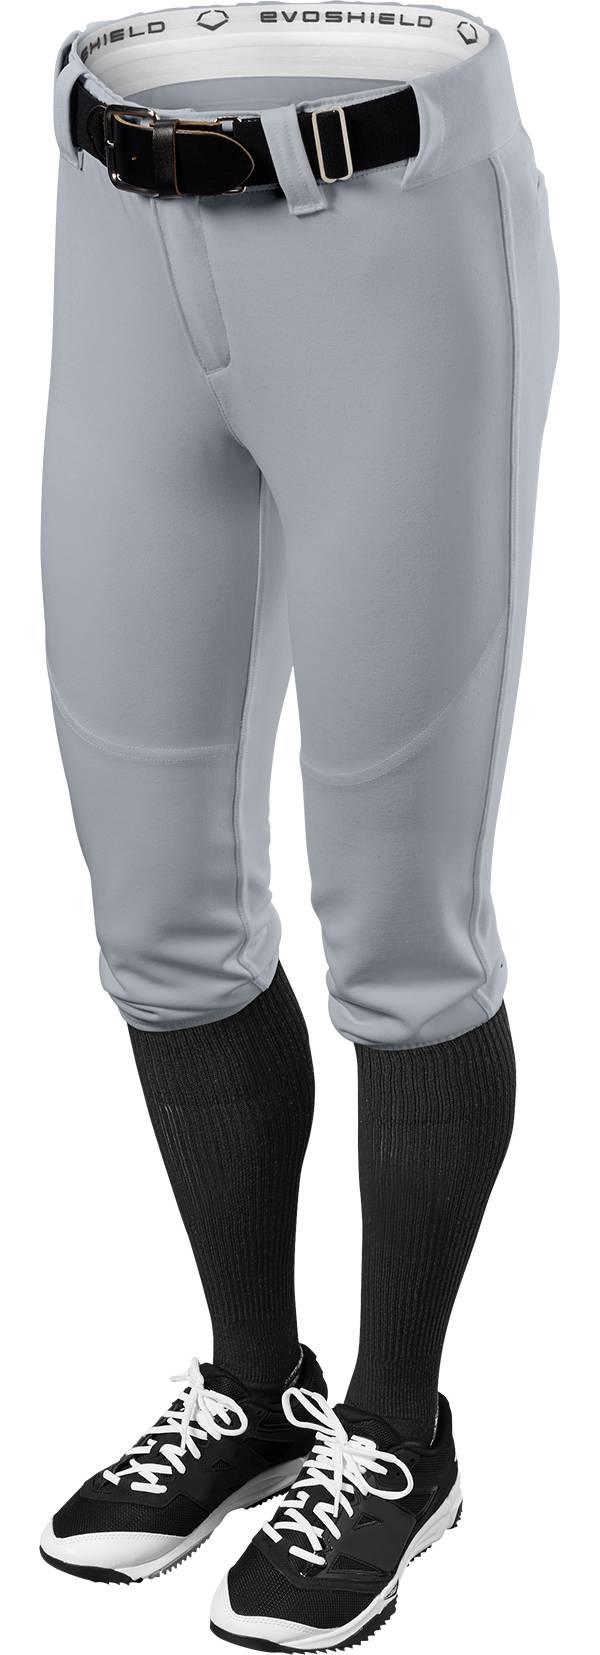 EvoShield Girls' FX Low Rise Softball Pants product image